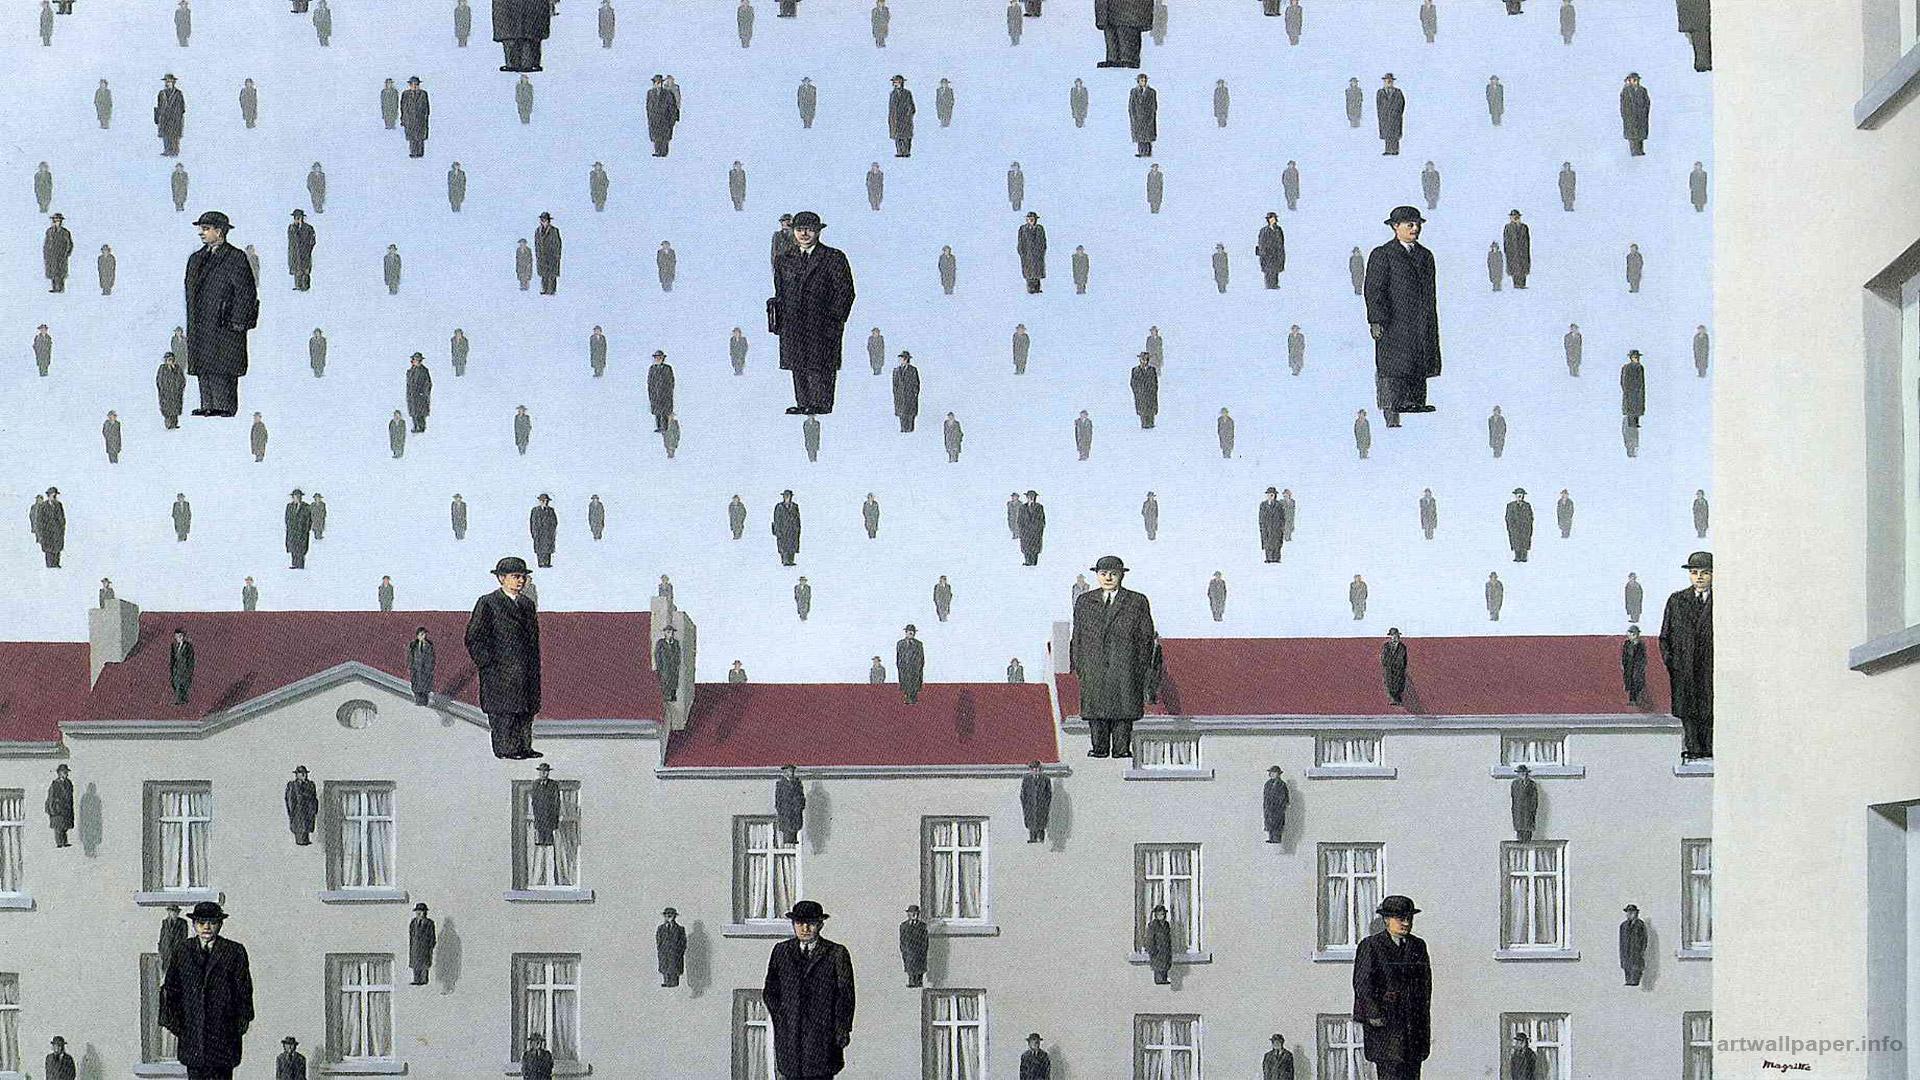 Rene Magritte Wallpaper 02 1920x1080